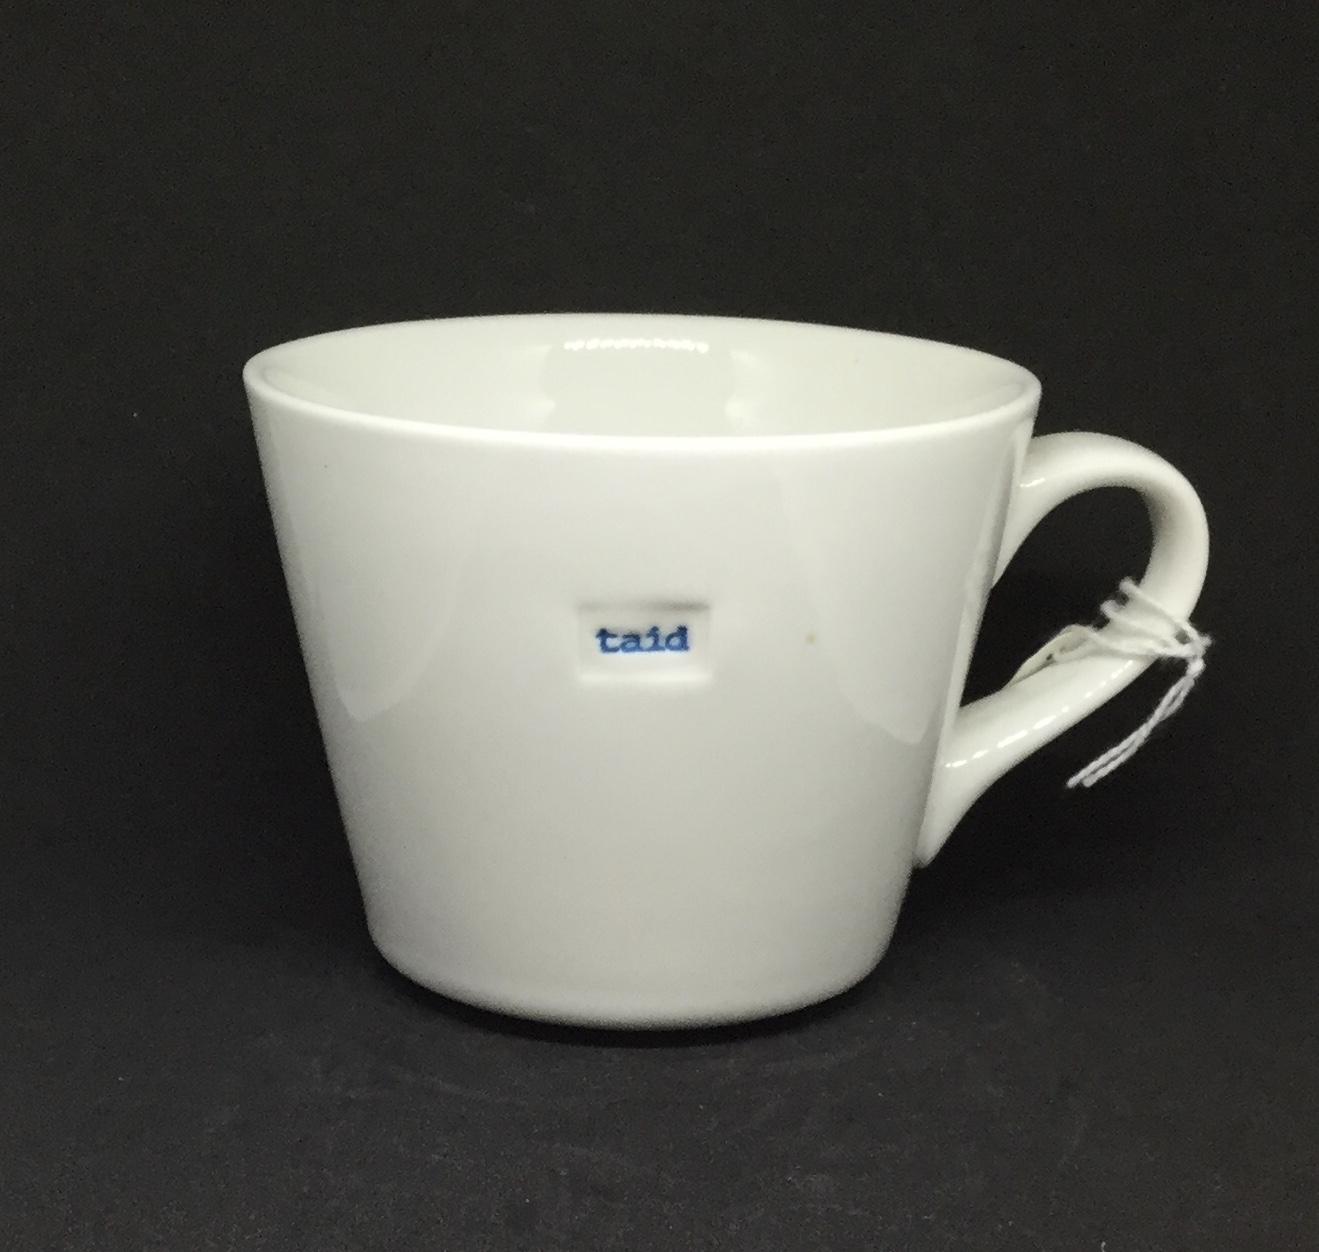 'Taid' fine bone China mug